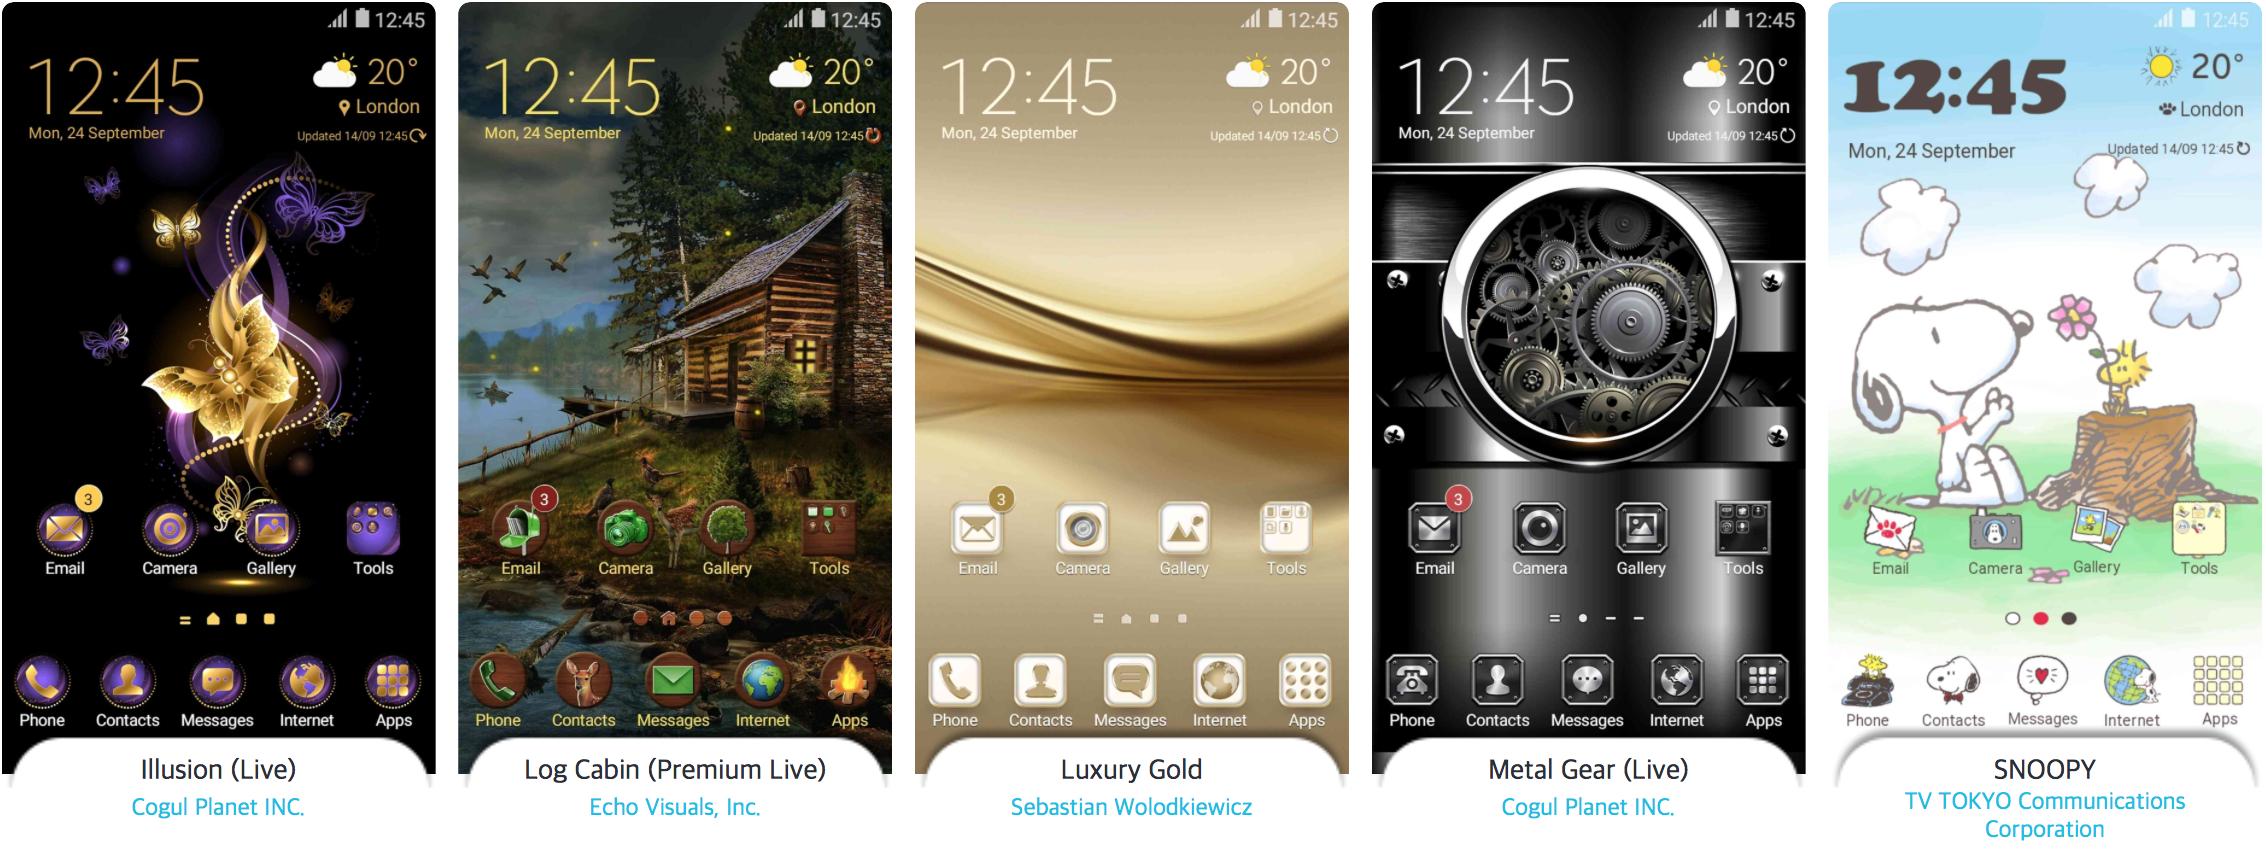 Samsung showcases the best themes of 2016 - SamMobile - SamMobile